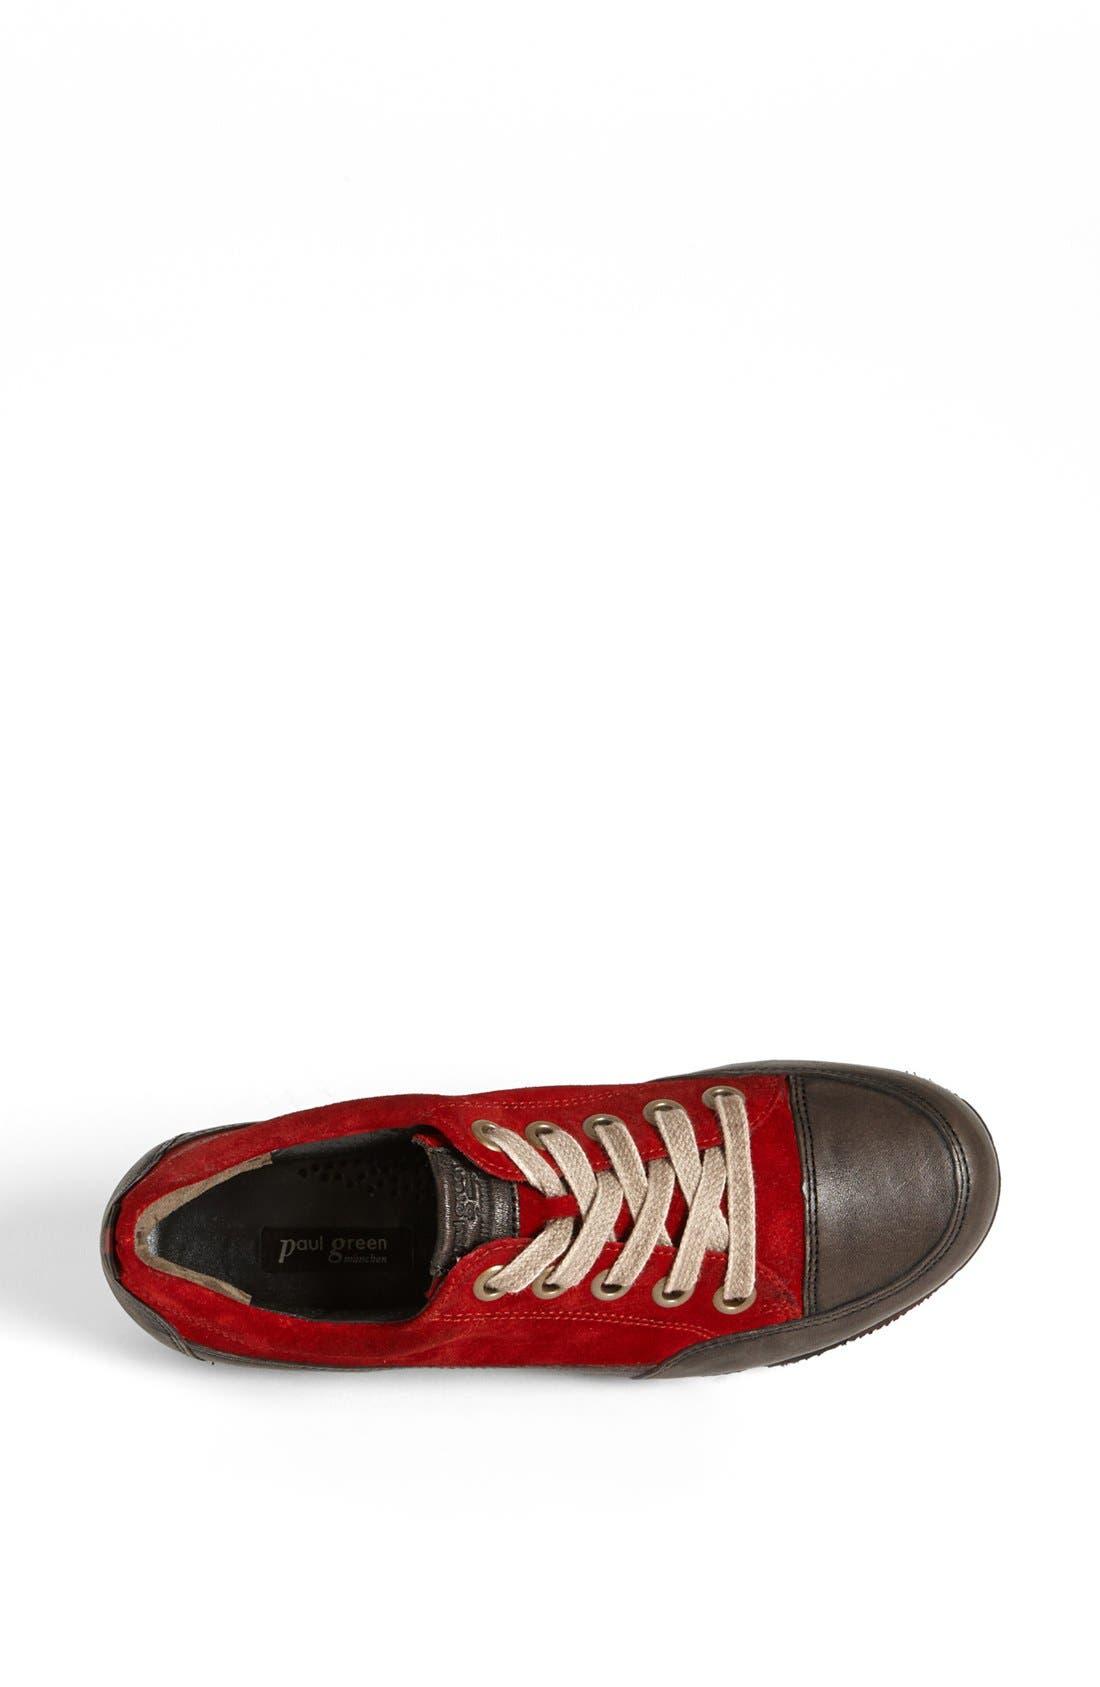 Alternate Image 3  - Paul Green 'Posh' Sneaker